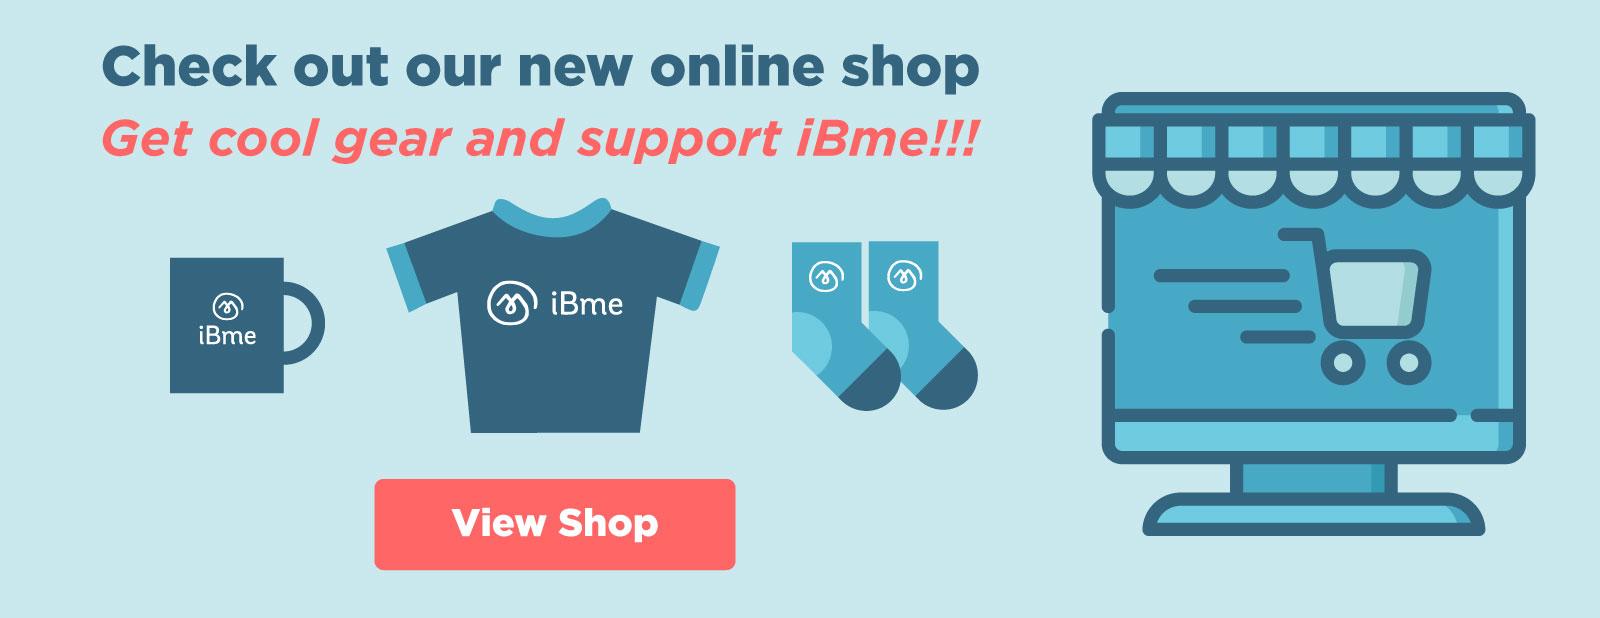 iBme Online Shop